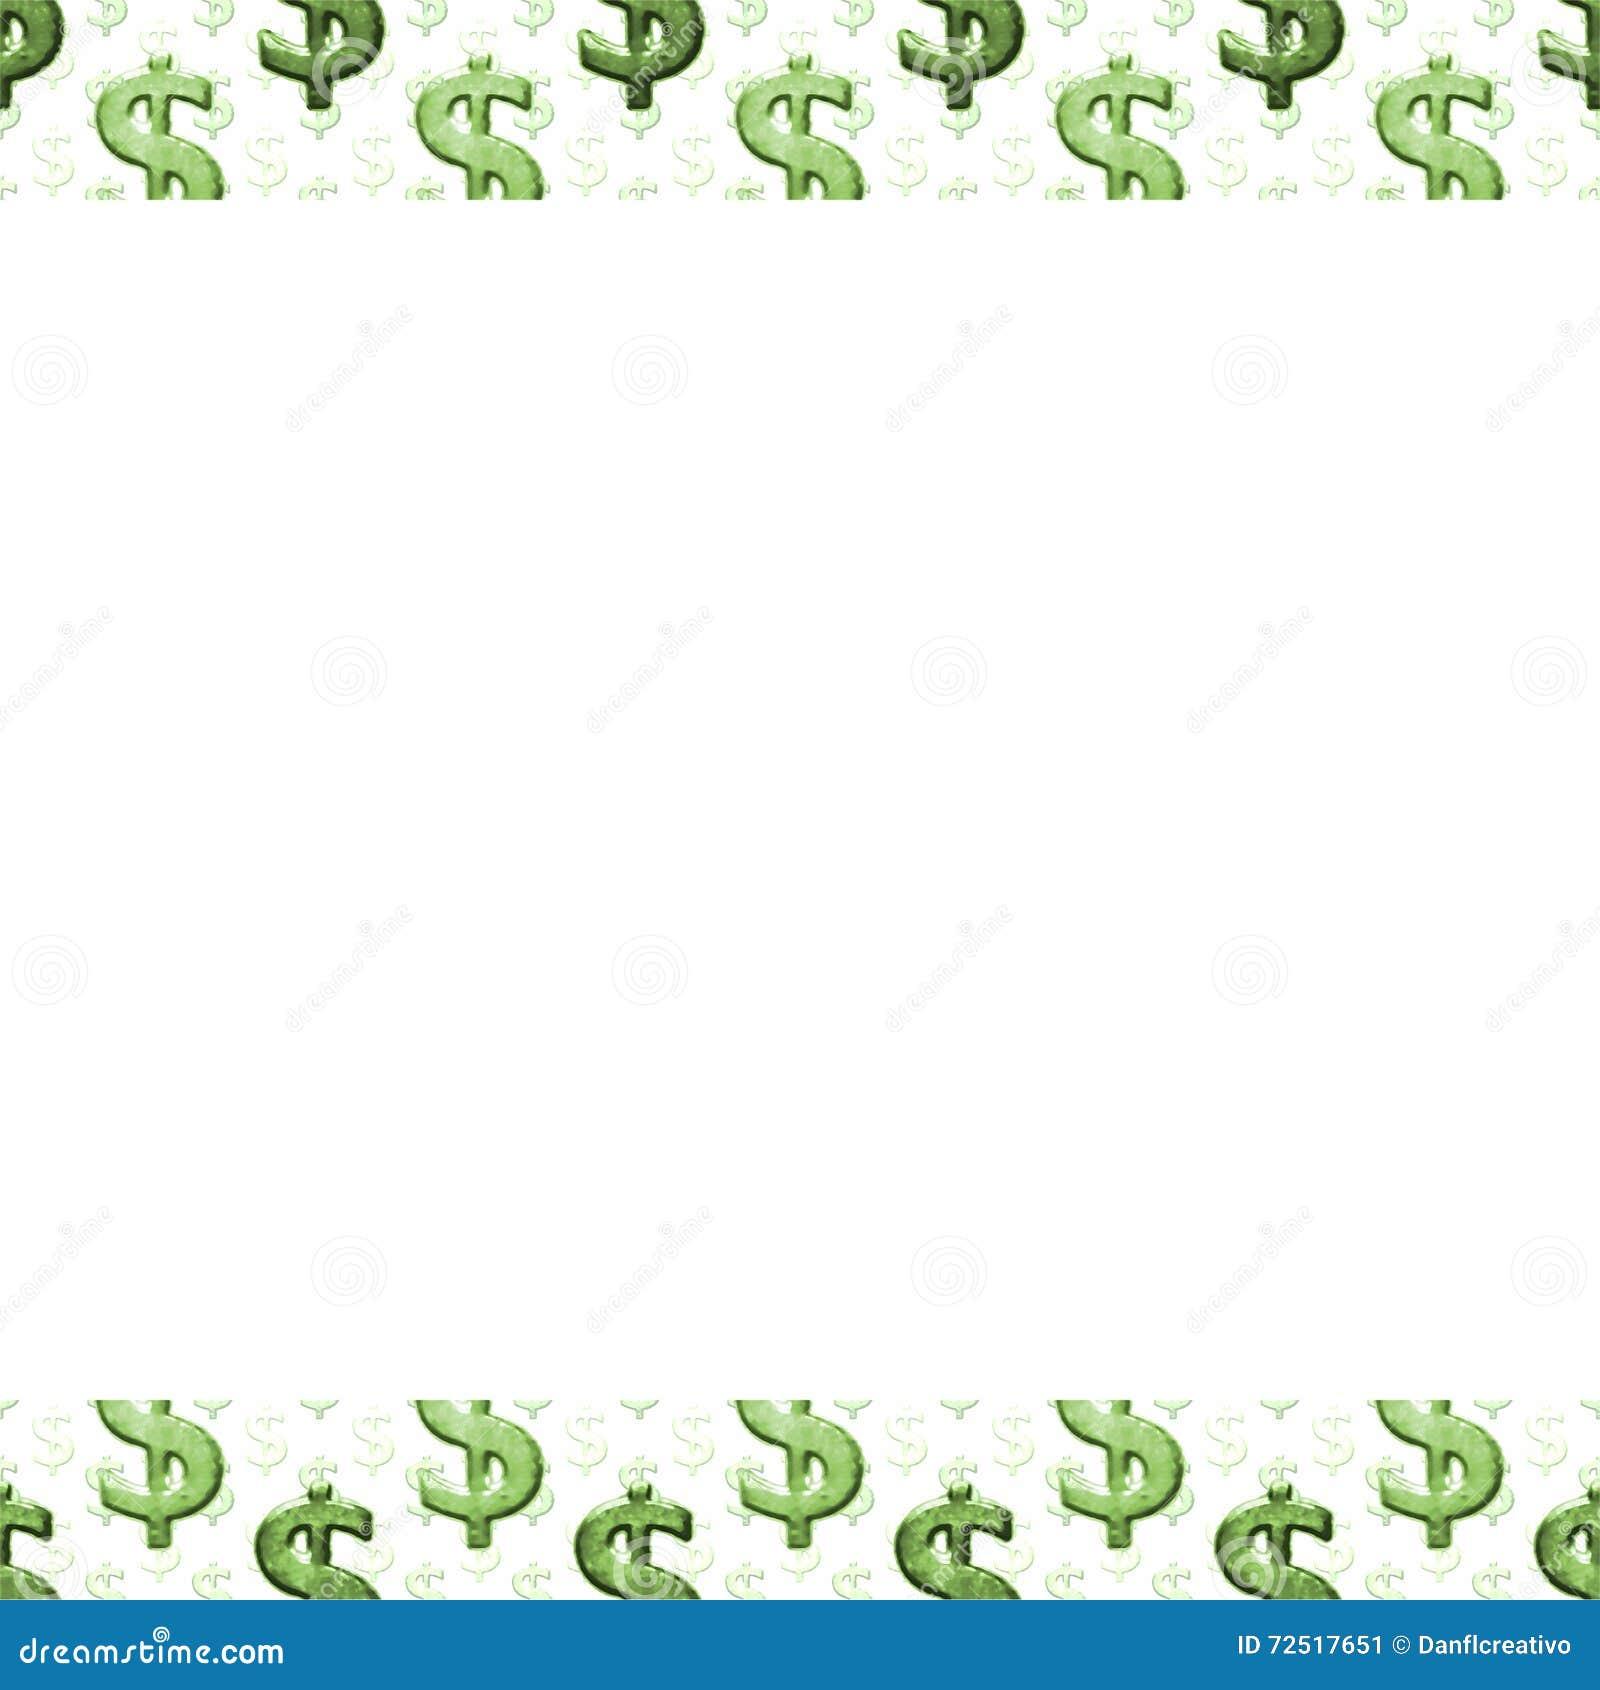 White Background With Money Pattern Borders Stock Illustration - Image ...